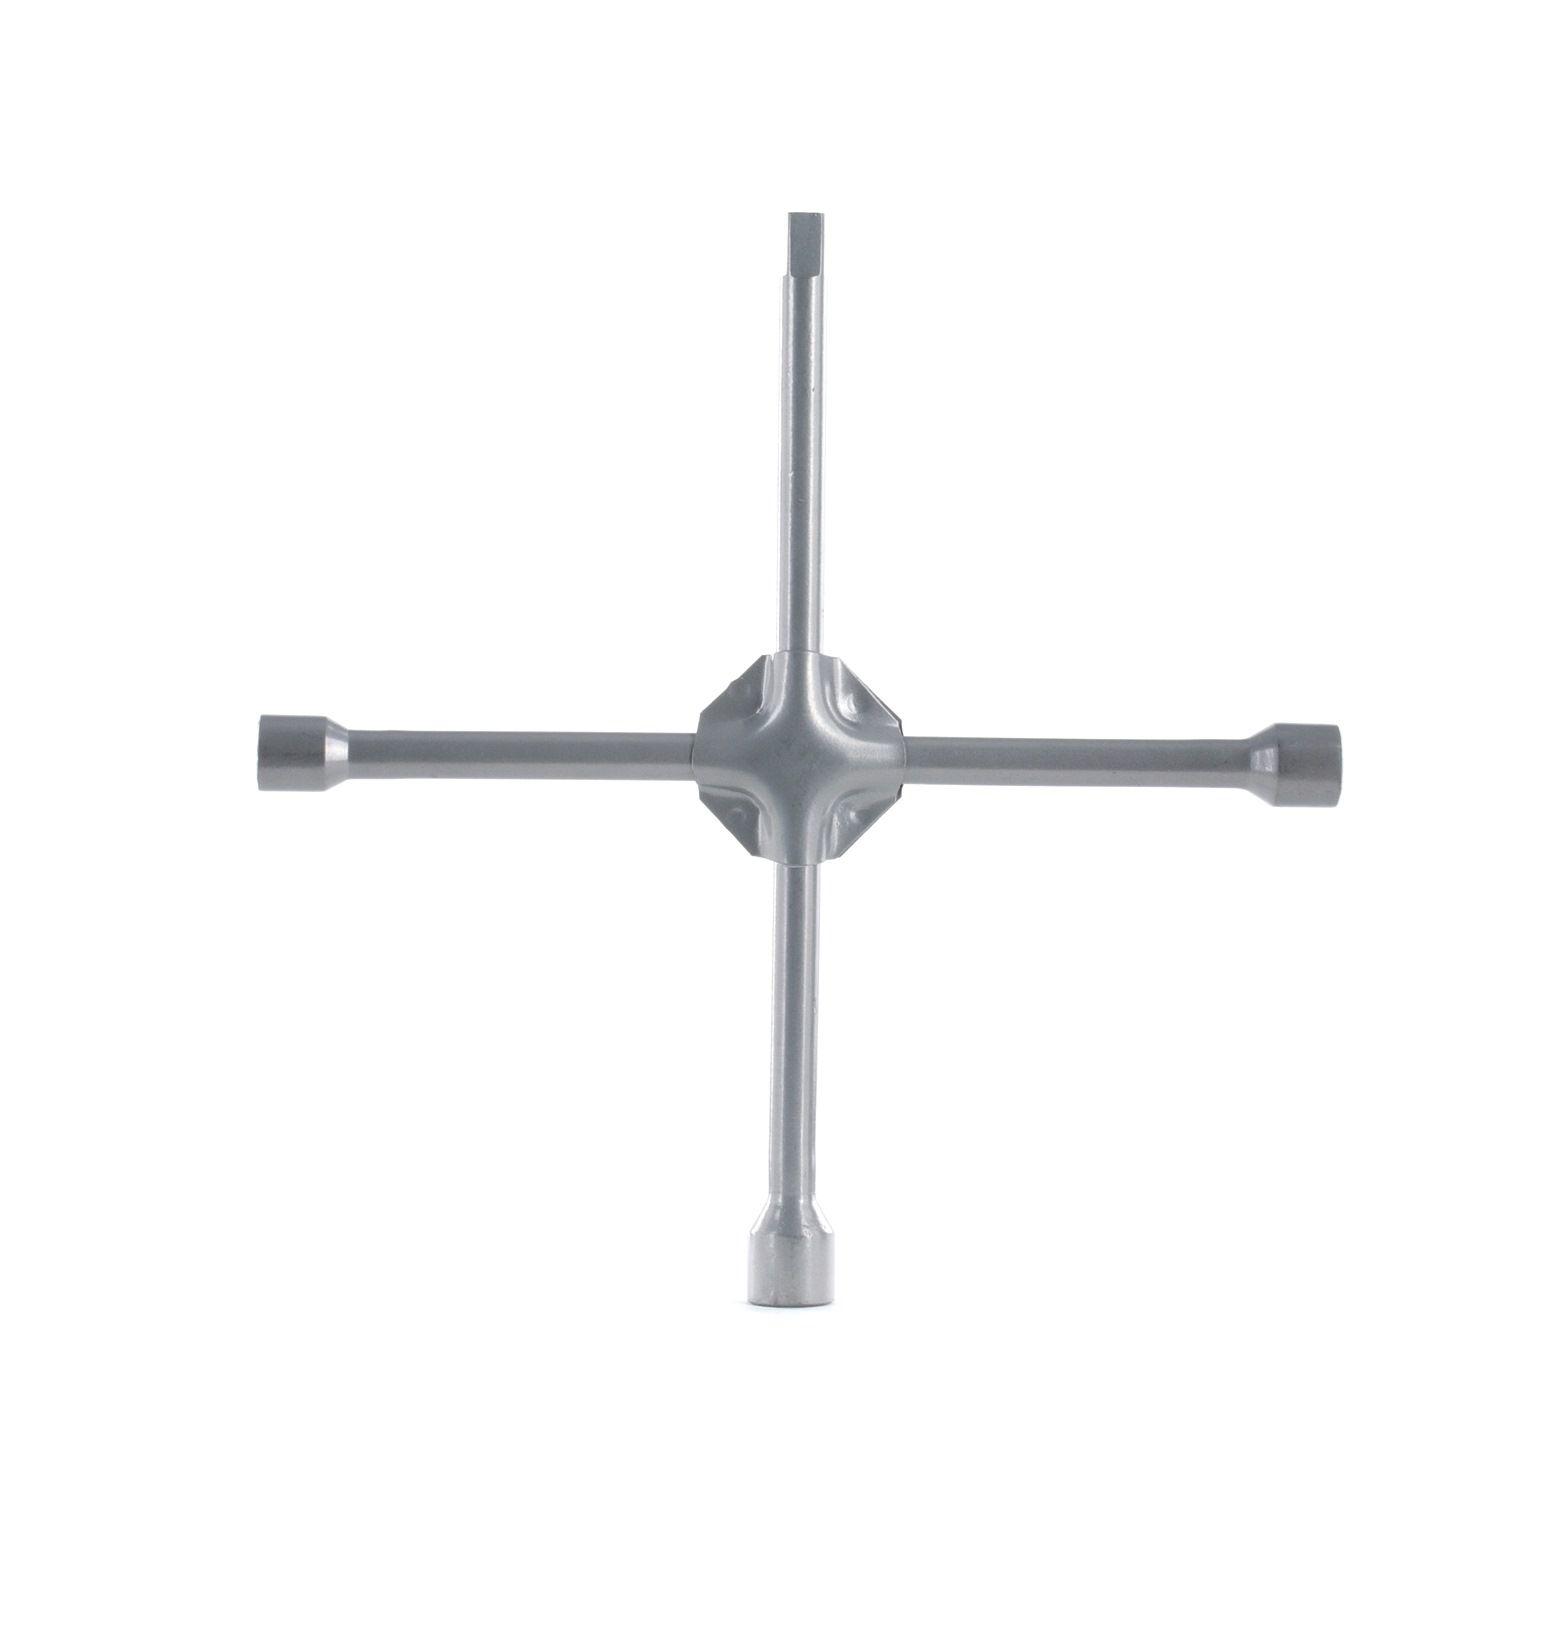 Four-way lug wrench ENERGY NE01005 rating